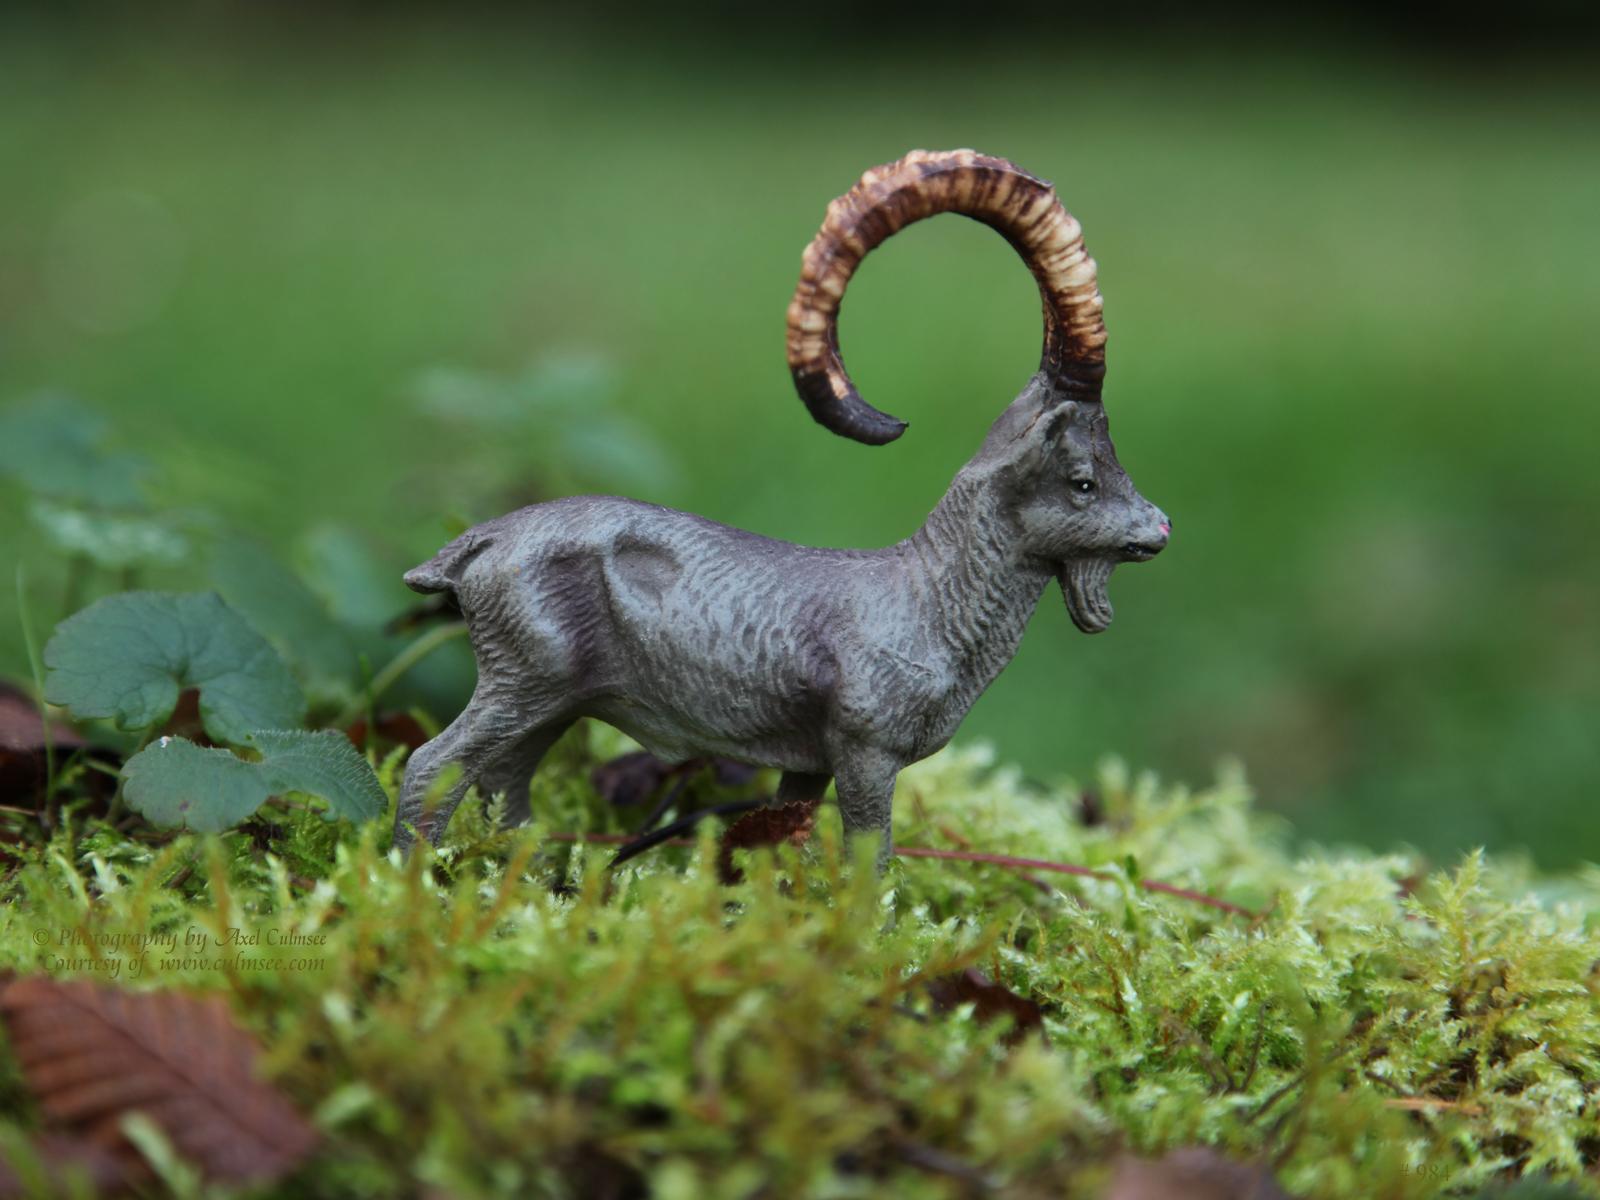 Alpensteinbock / Alpine ibex/ Bouquetin des Alpes (Massefigur, Elastolin)